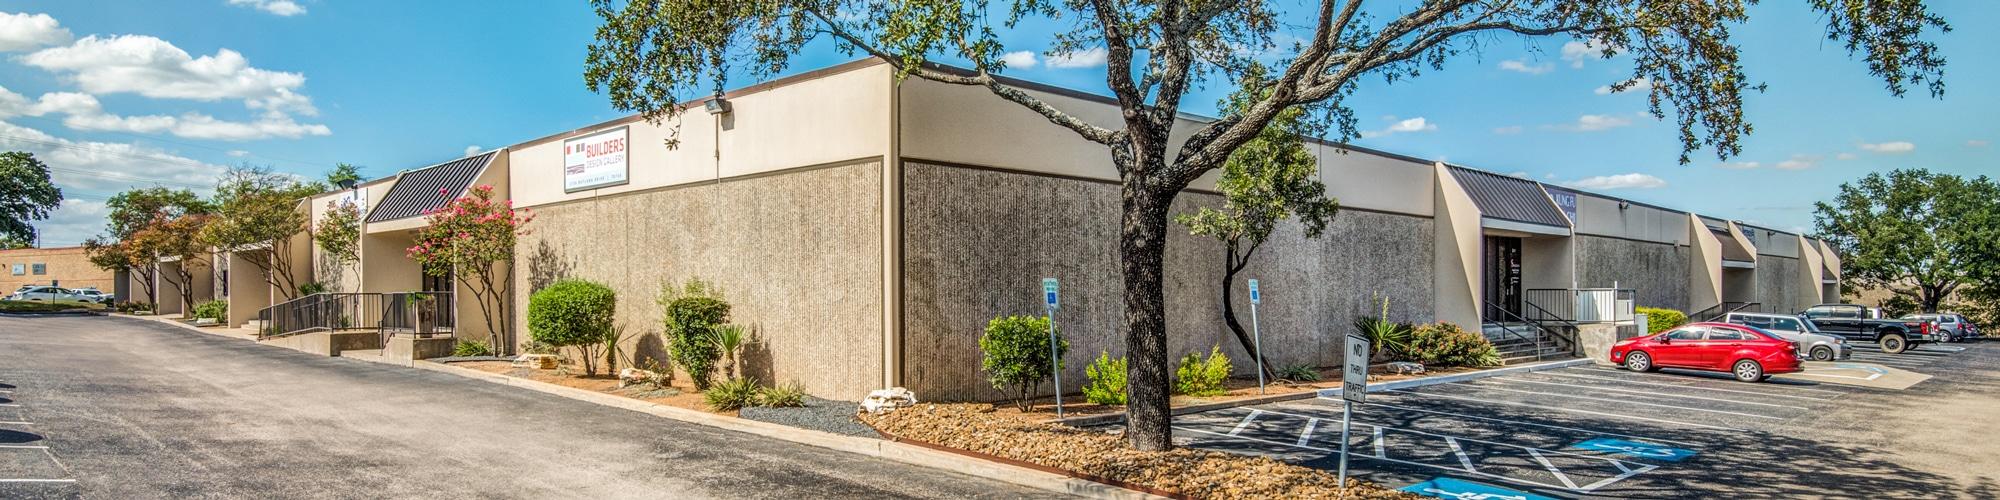 Rutland-Business-Center-2136-Rutland-Drive